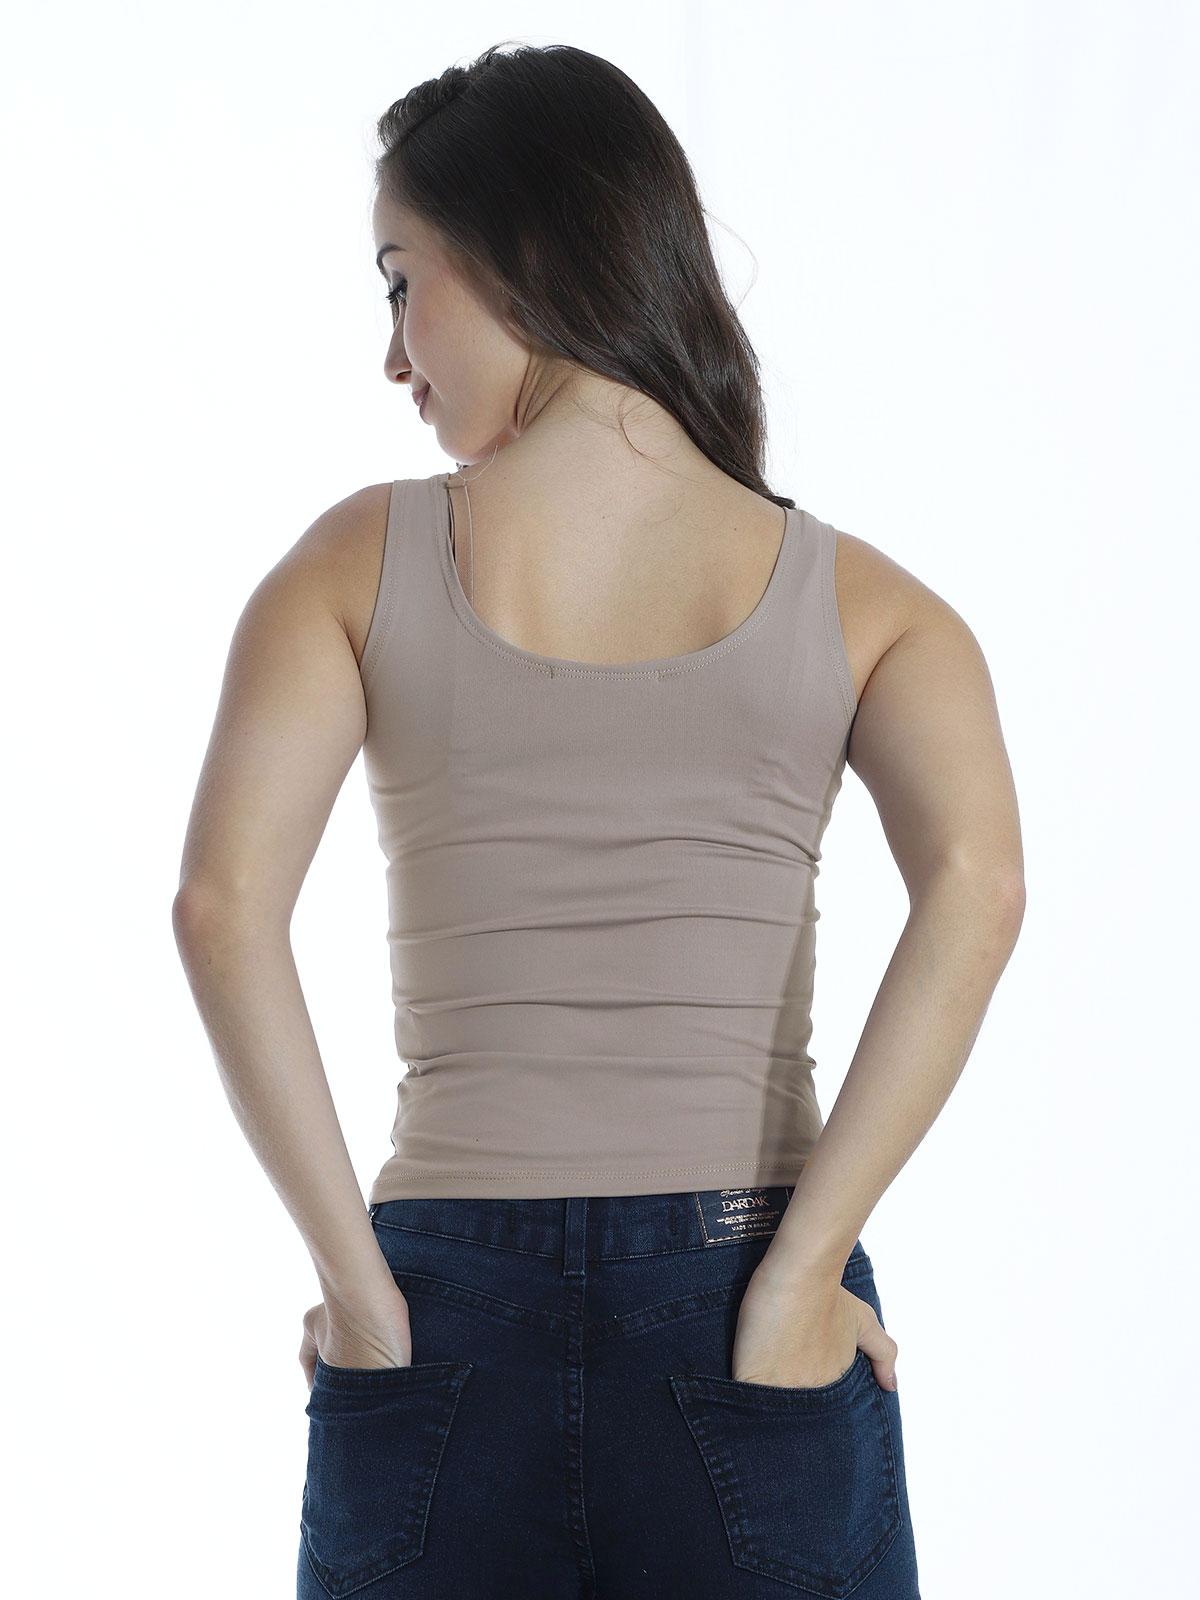 Regata Lisa Fitness Feminina Poliamida Básica Areia